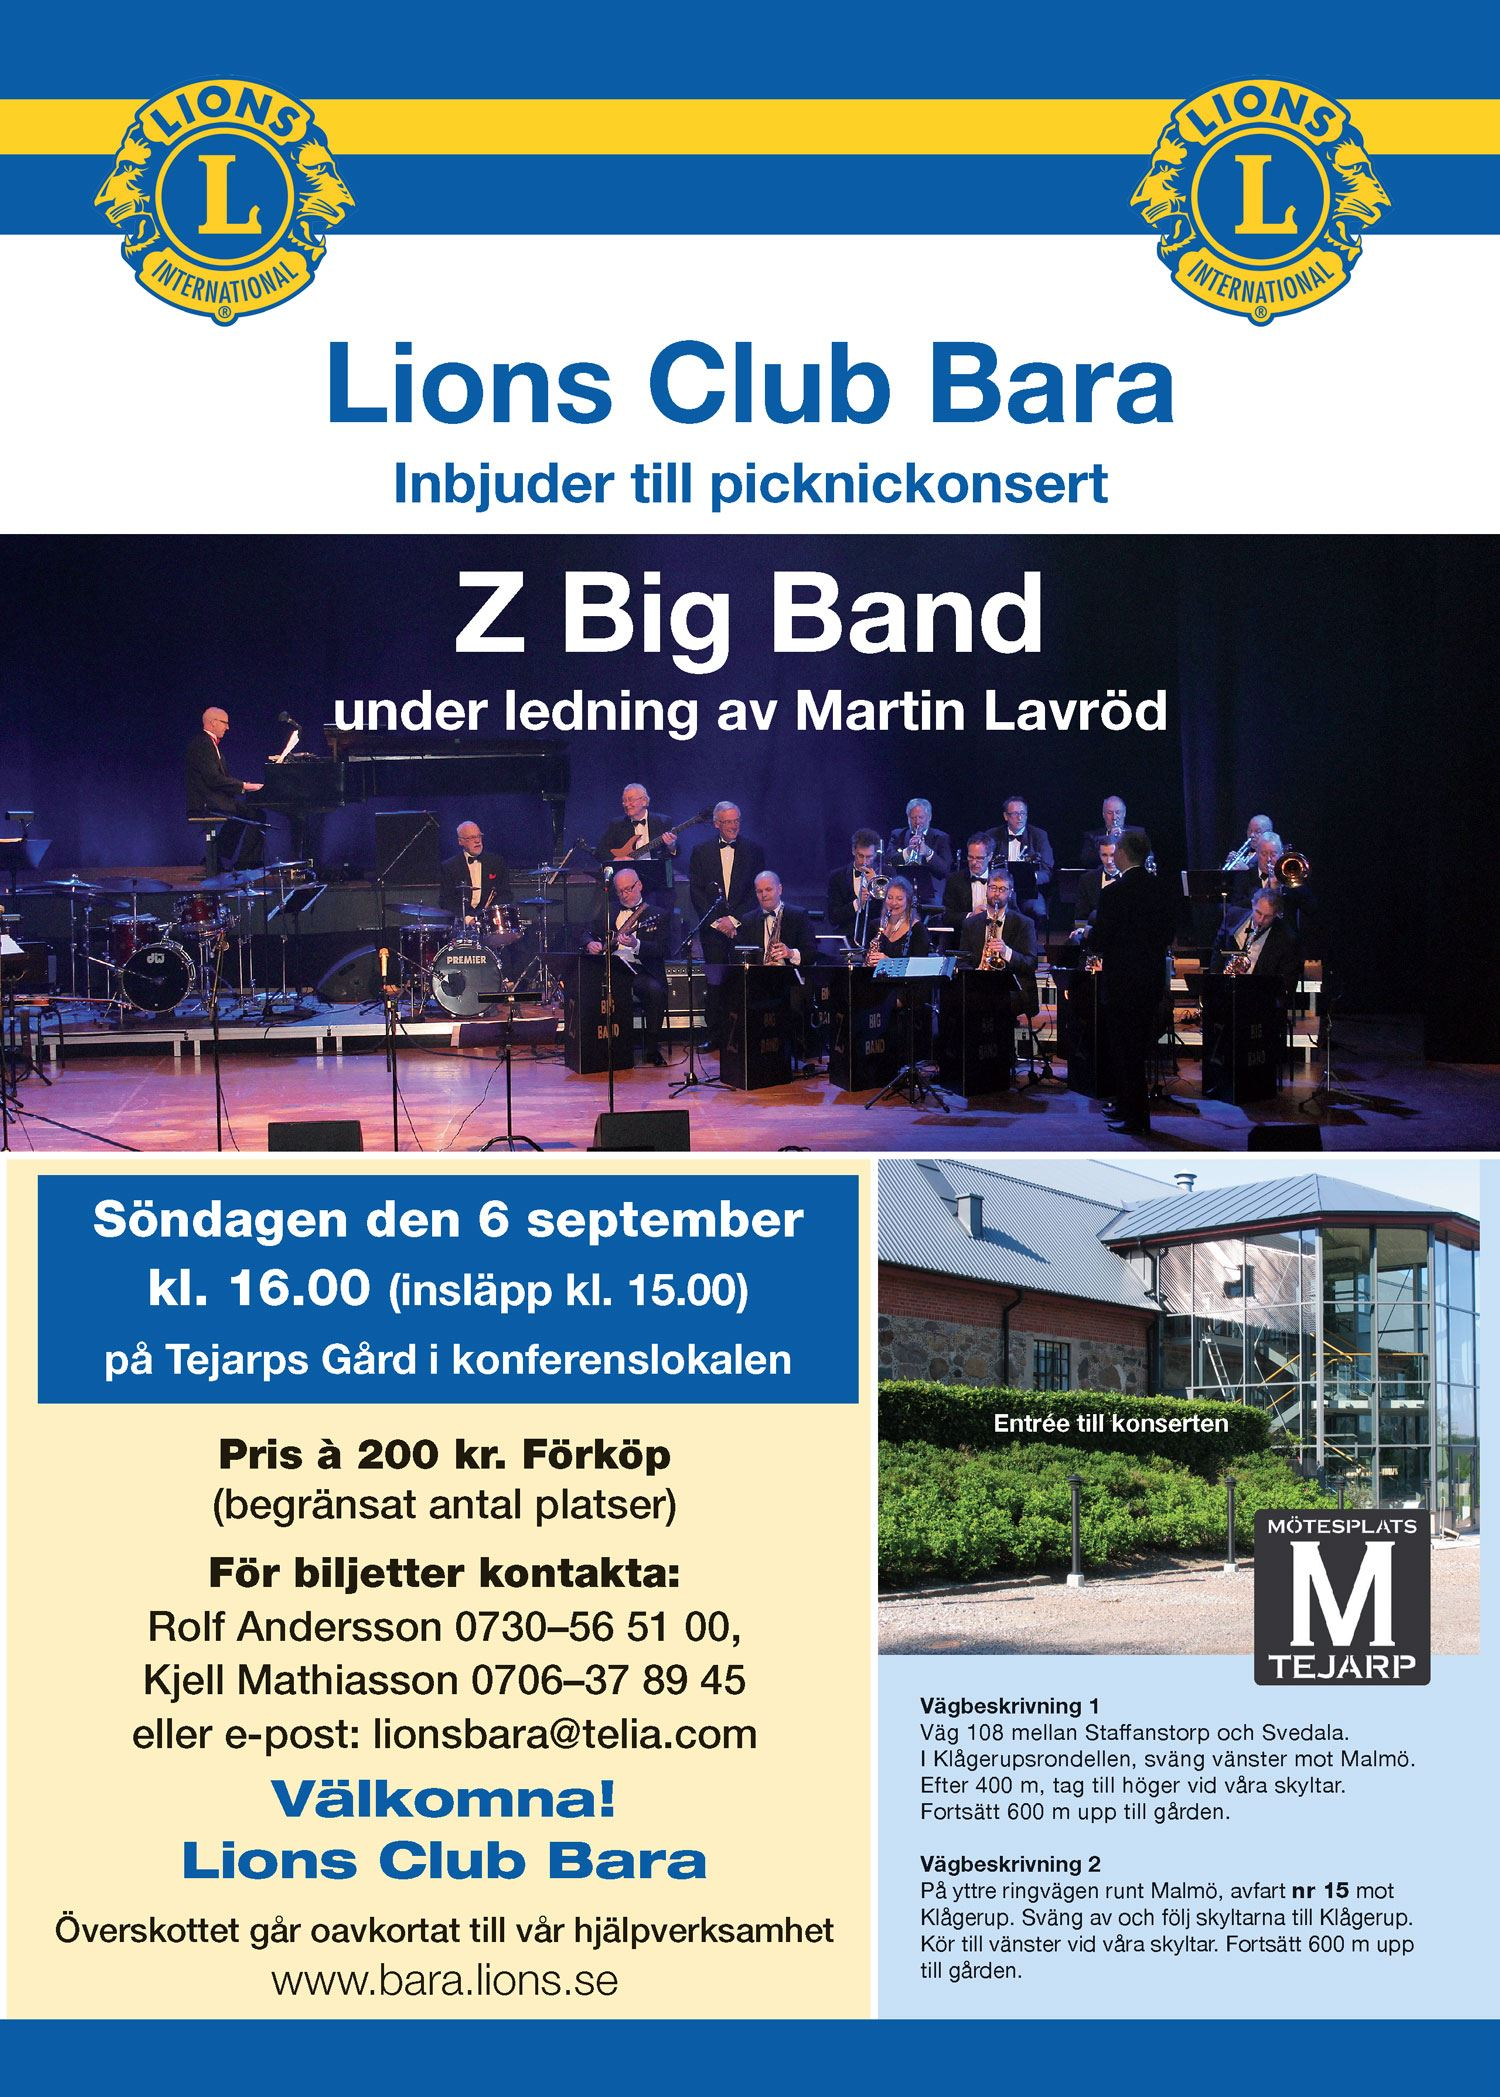 Picknickkonsert med Z Big Band